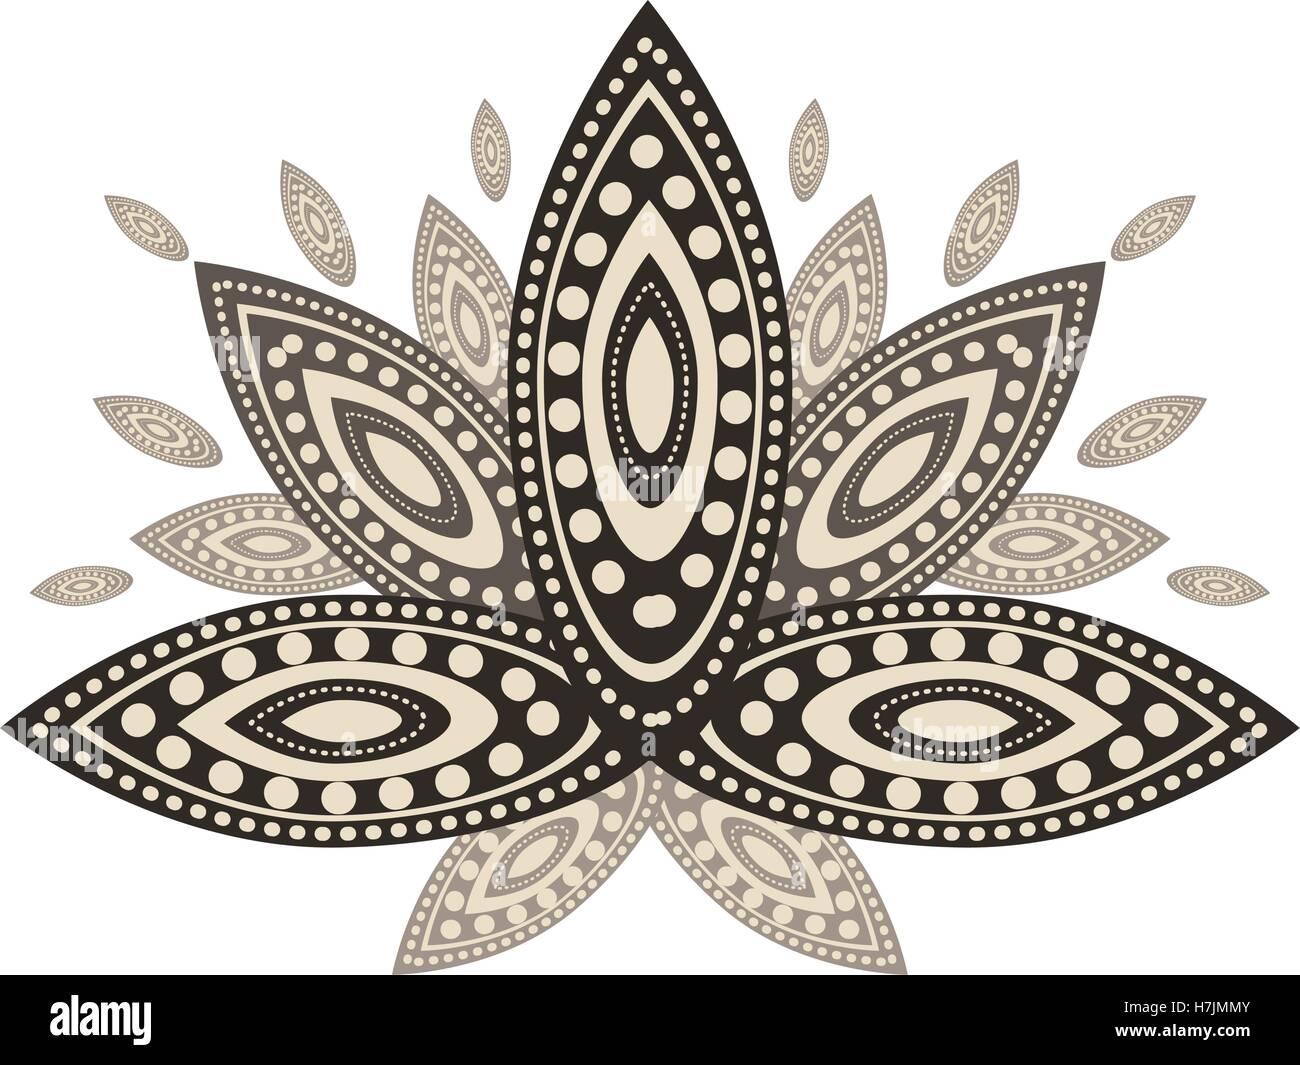 Ornamental Lotus Flower Ethnic Indian Art Over White Background